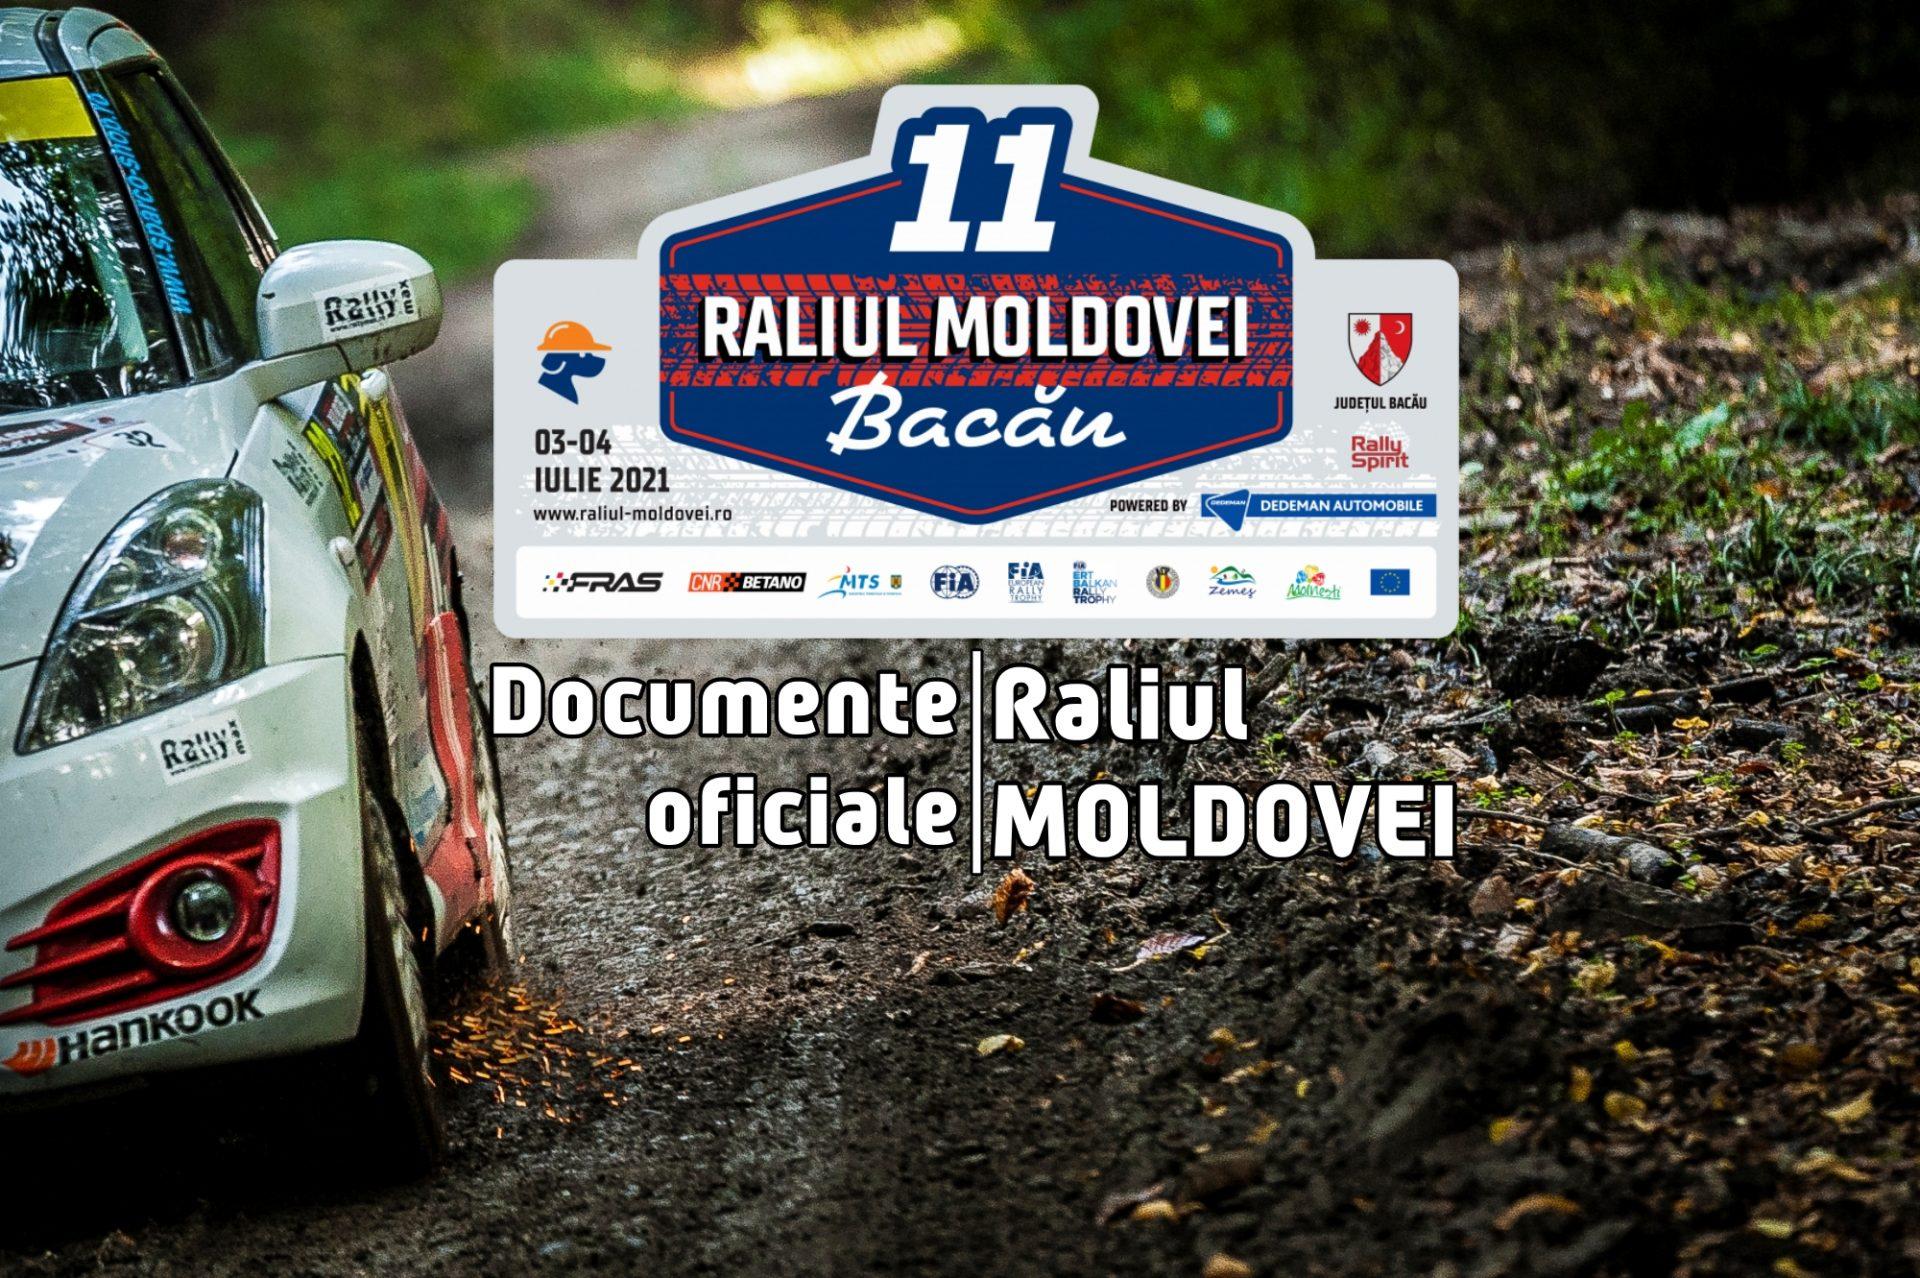 Raliul Moldovei 2021 – Documente oficiale